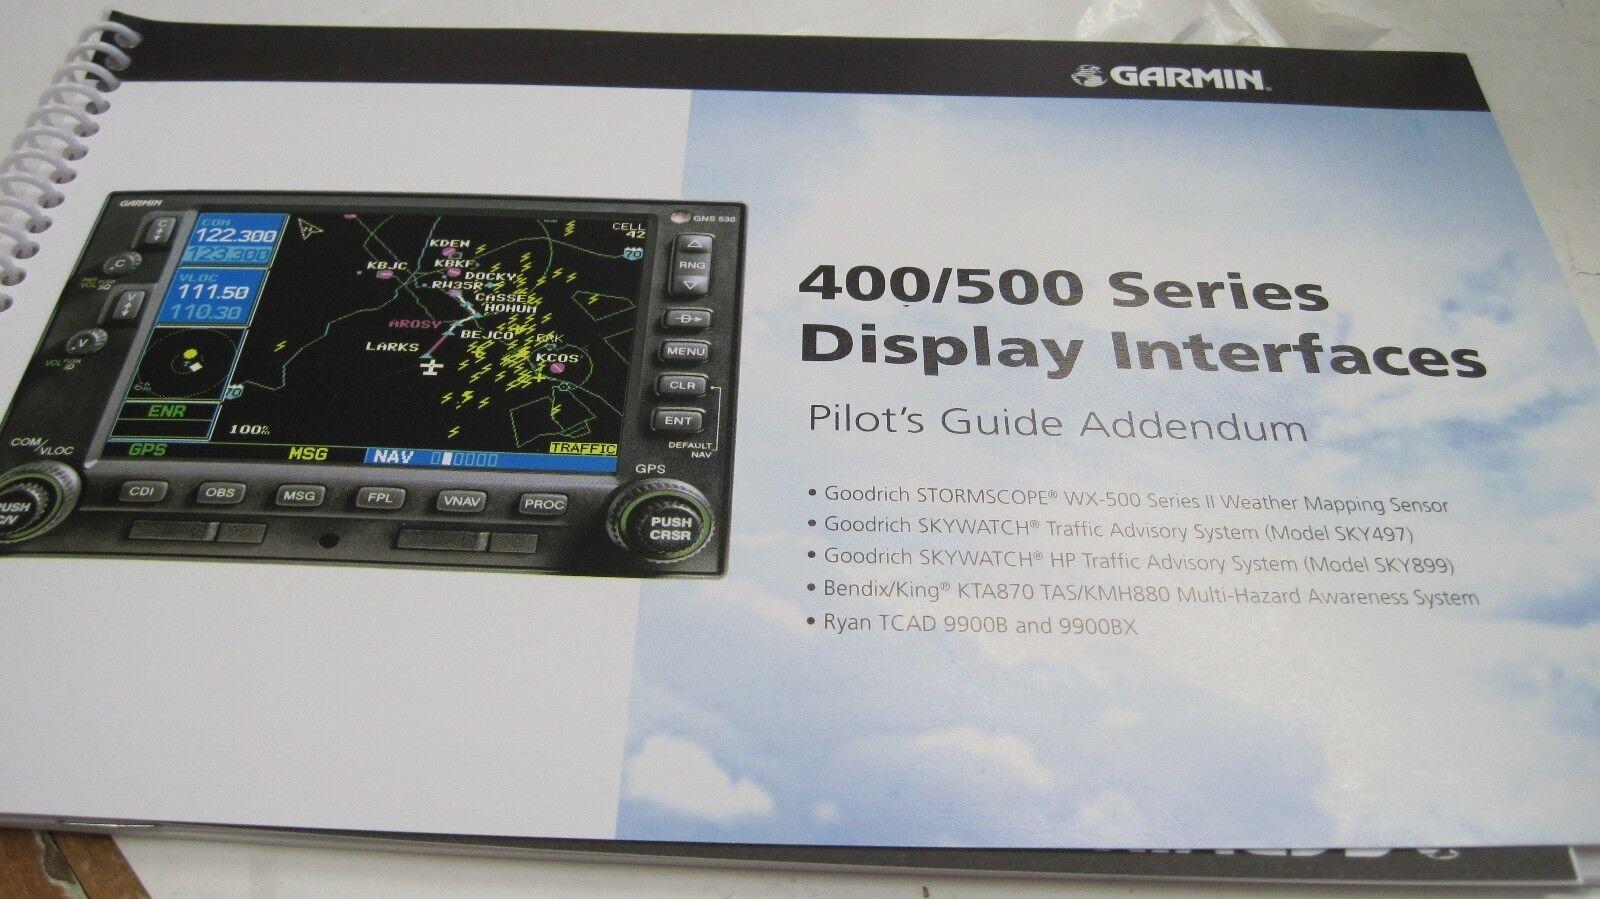 Garmin 400/500 Series Display Interfaces Pilots Guide Addendum